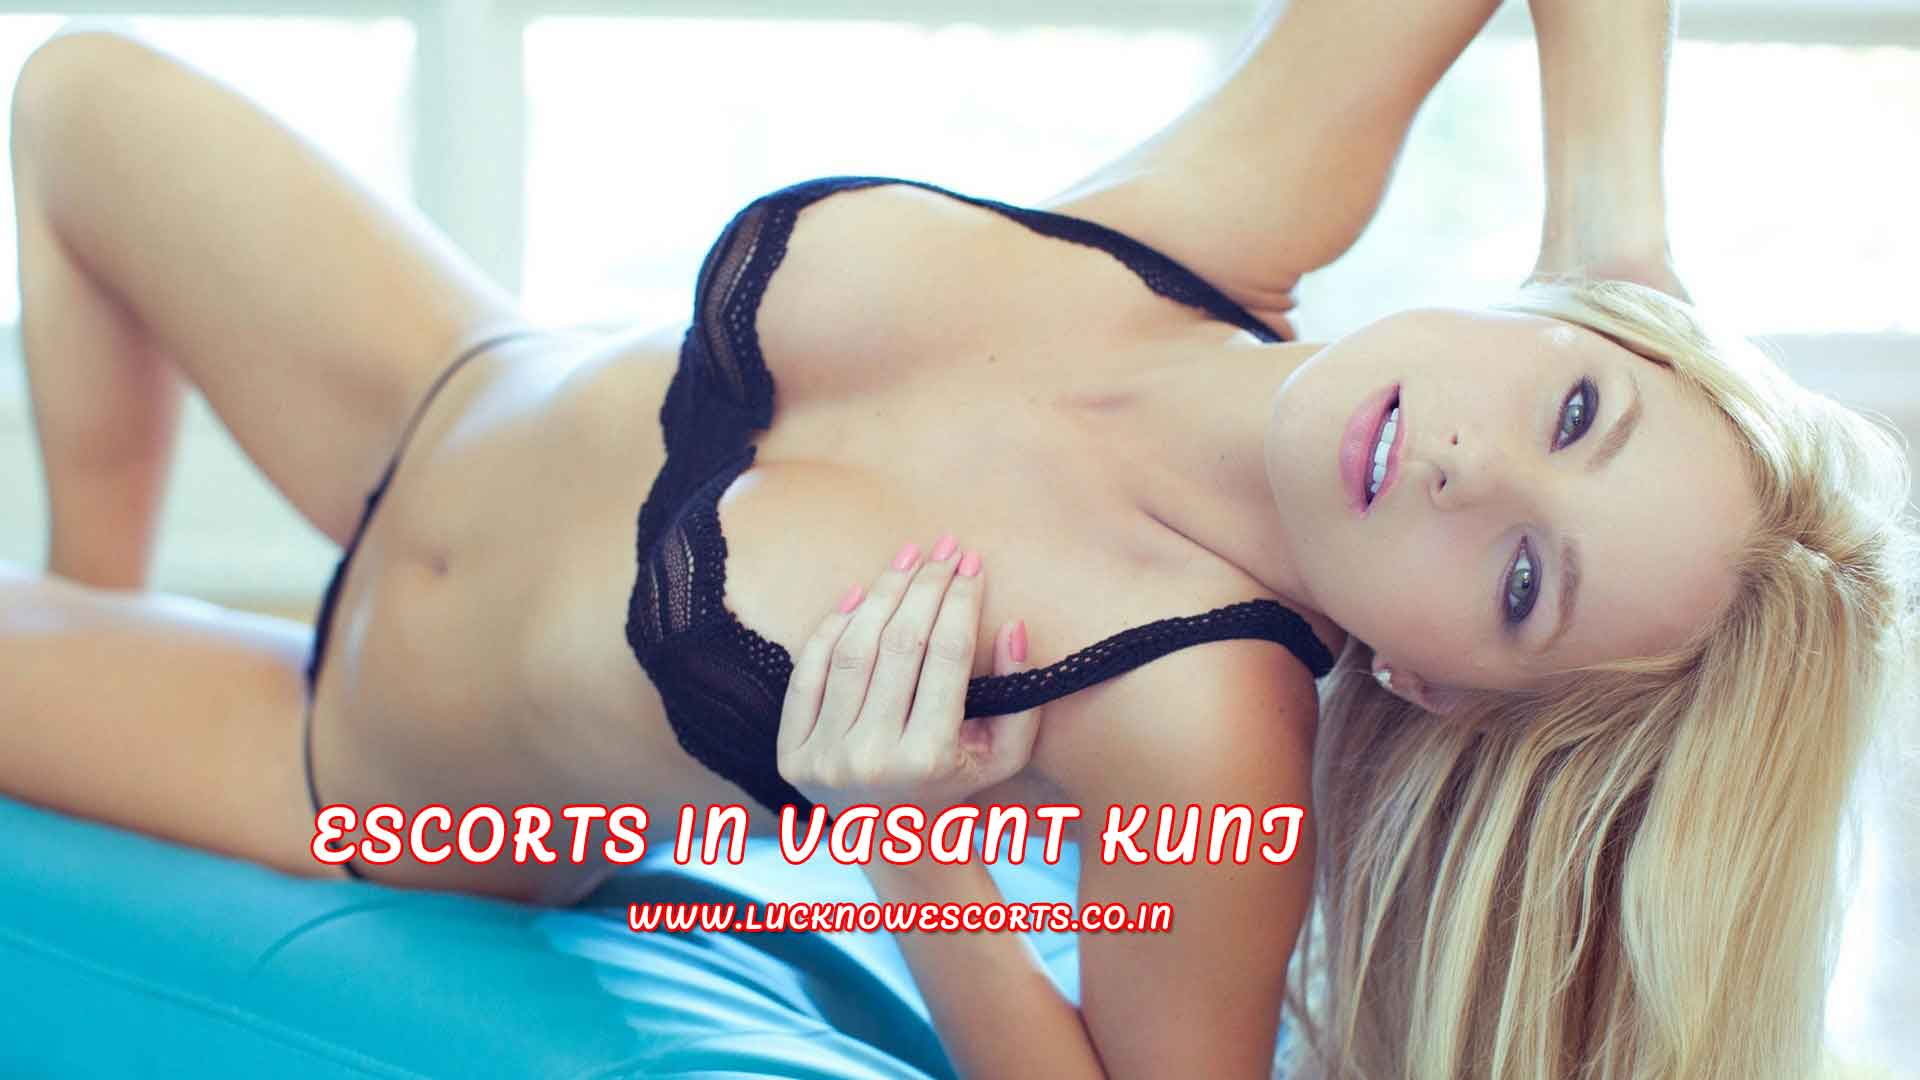 call-girls-in-vasant-kunj